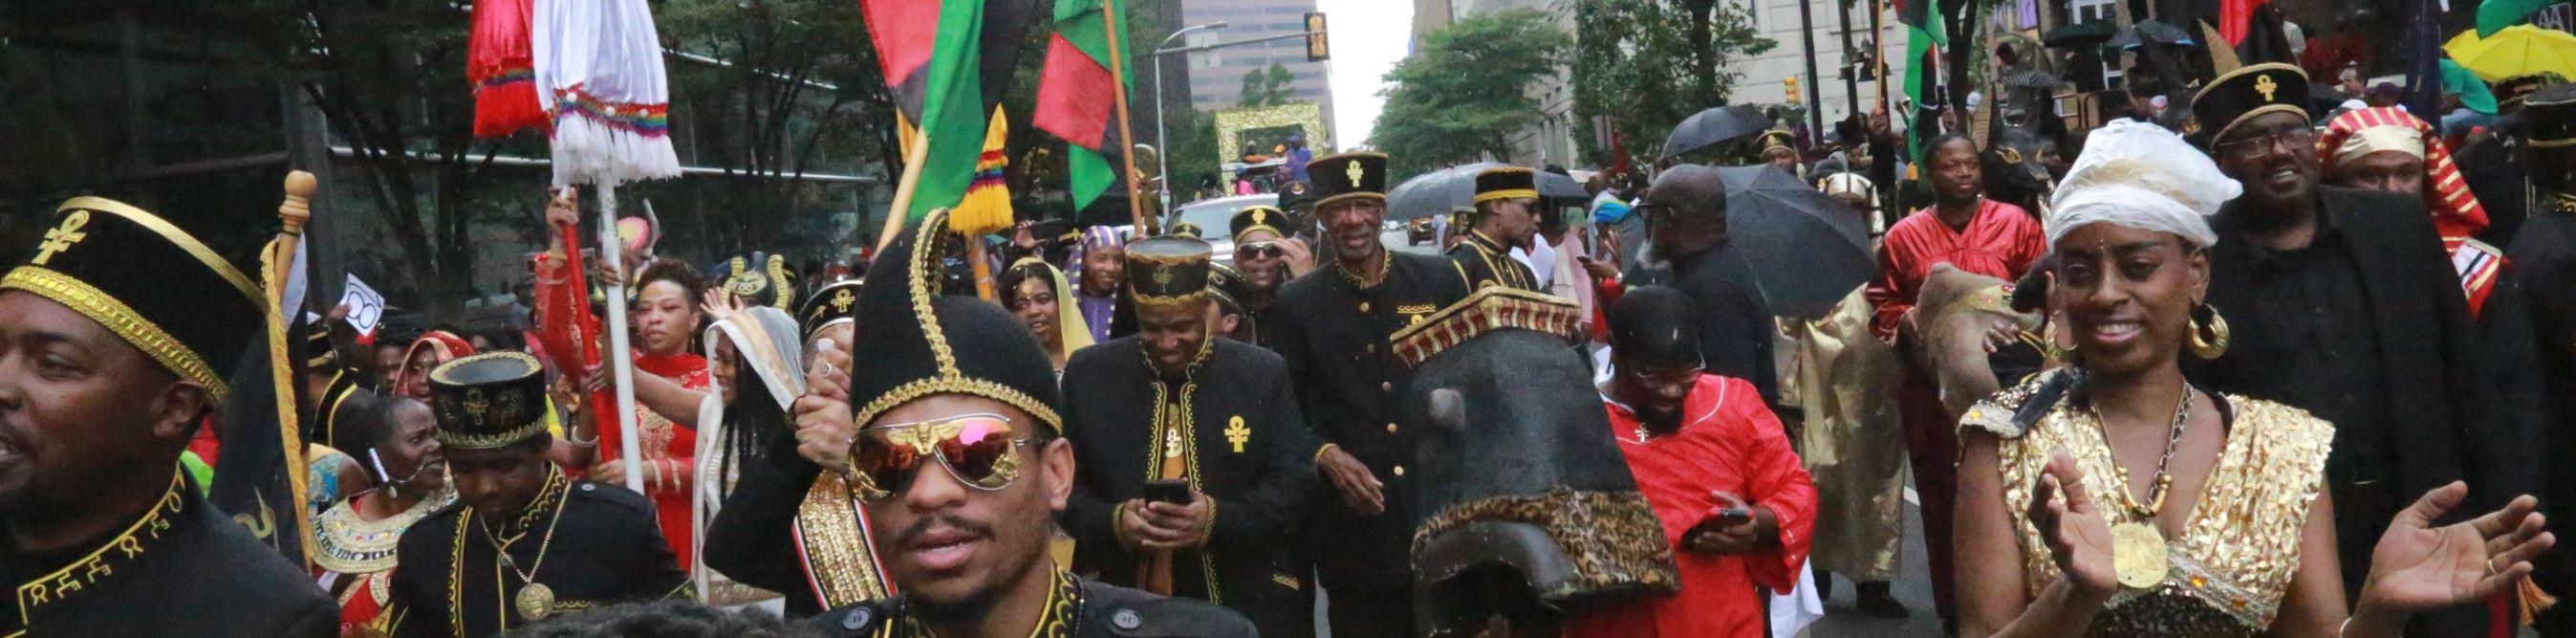 2017 Juneteenth Parade